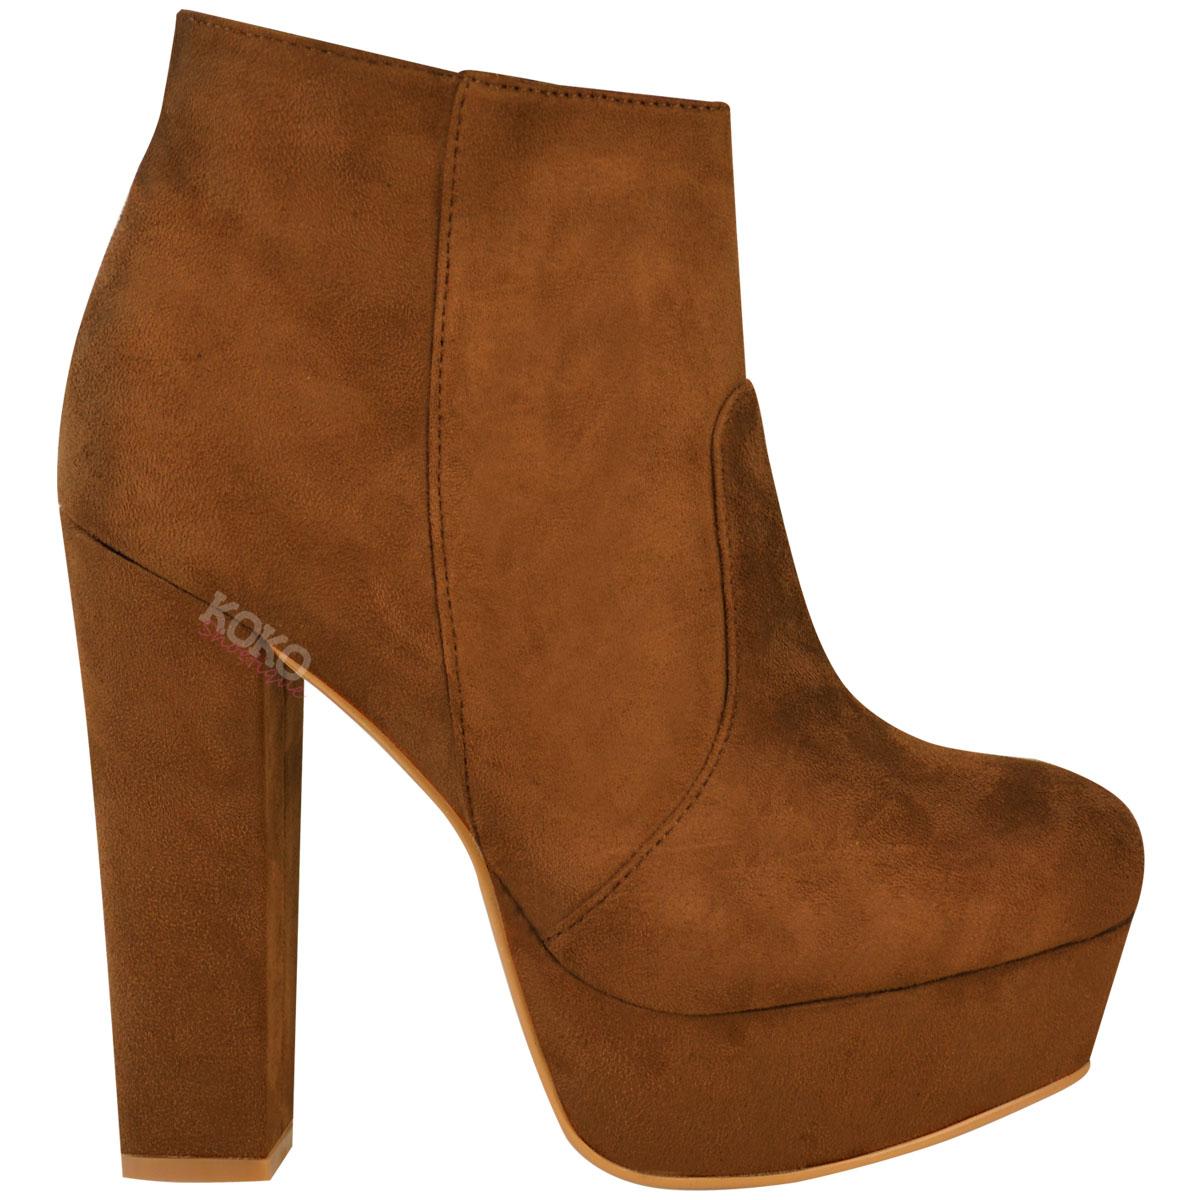 new womens plain block high heels platform ankle